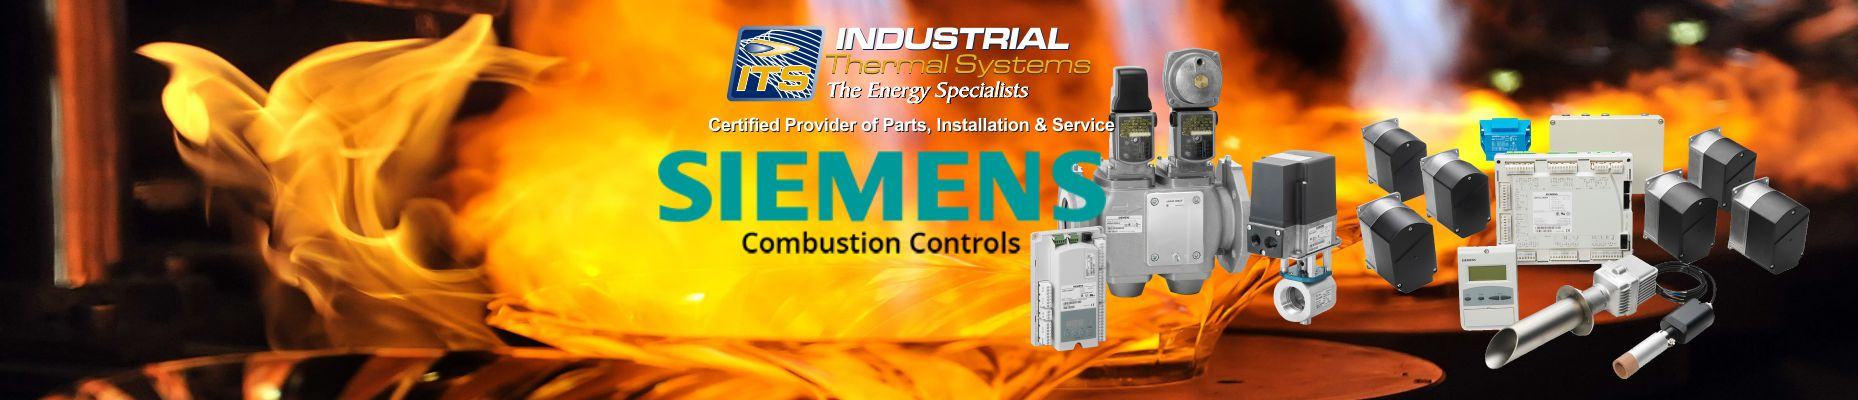 Siemens Combustion Controls